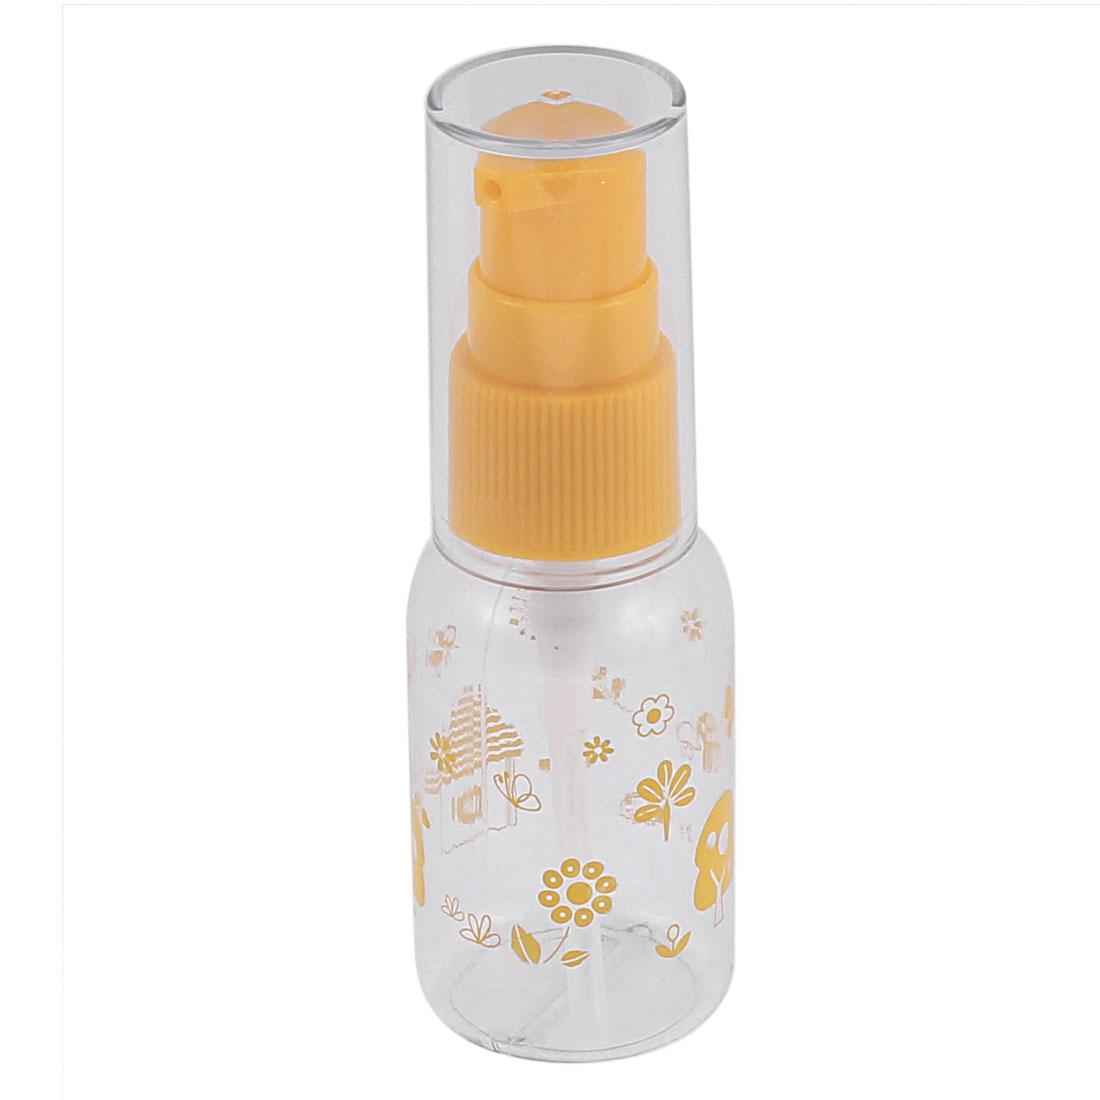 Traveling Flower Pattern Cosmetic Liquid Spray Bottle 30ml Orange